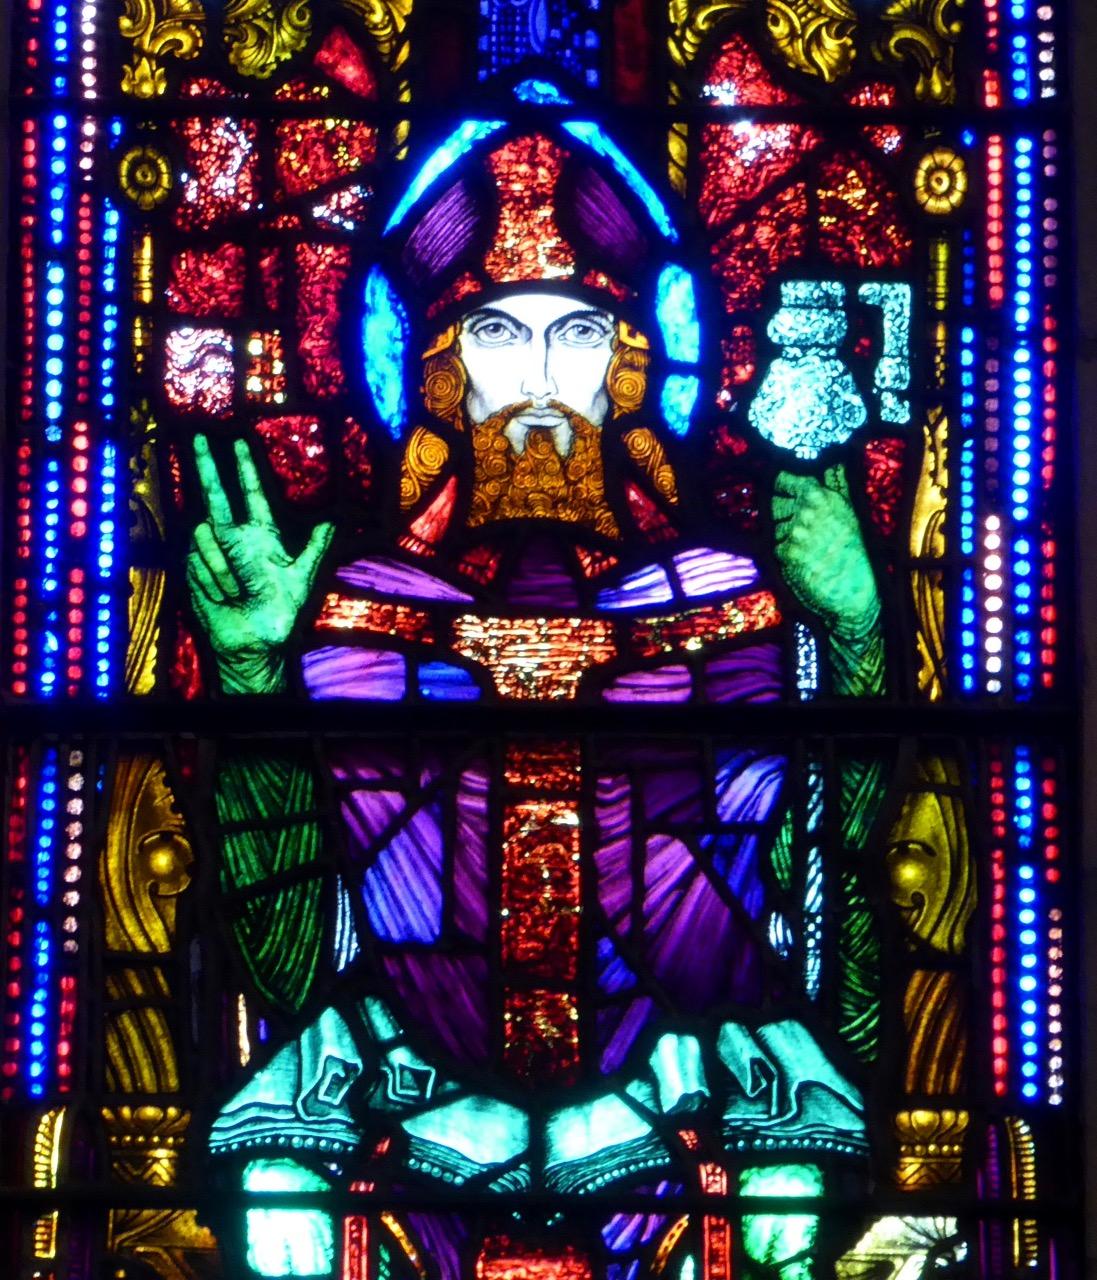 Honan Albert of Cashel